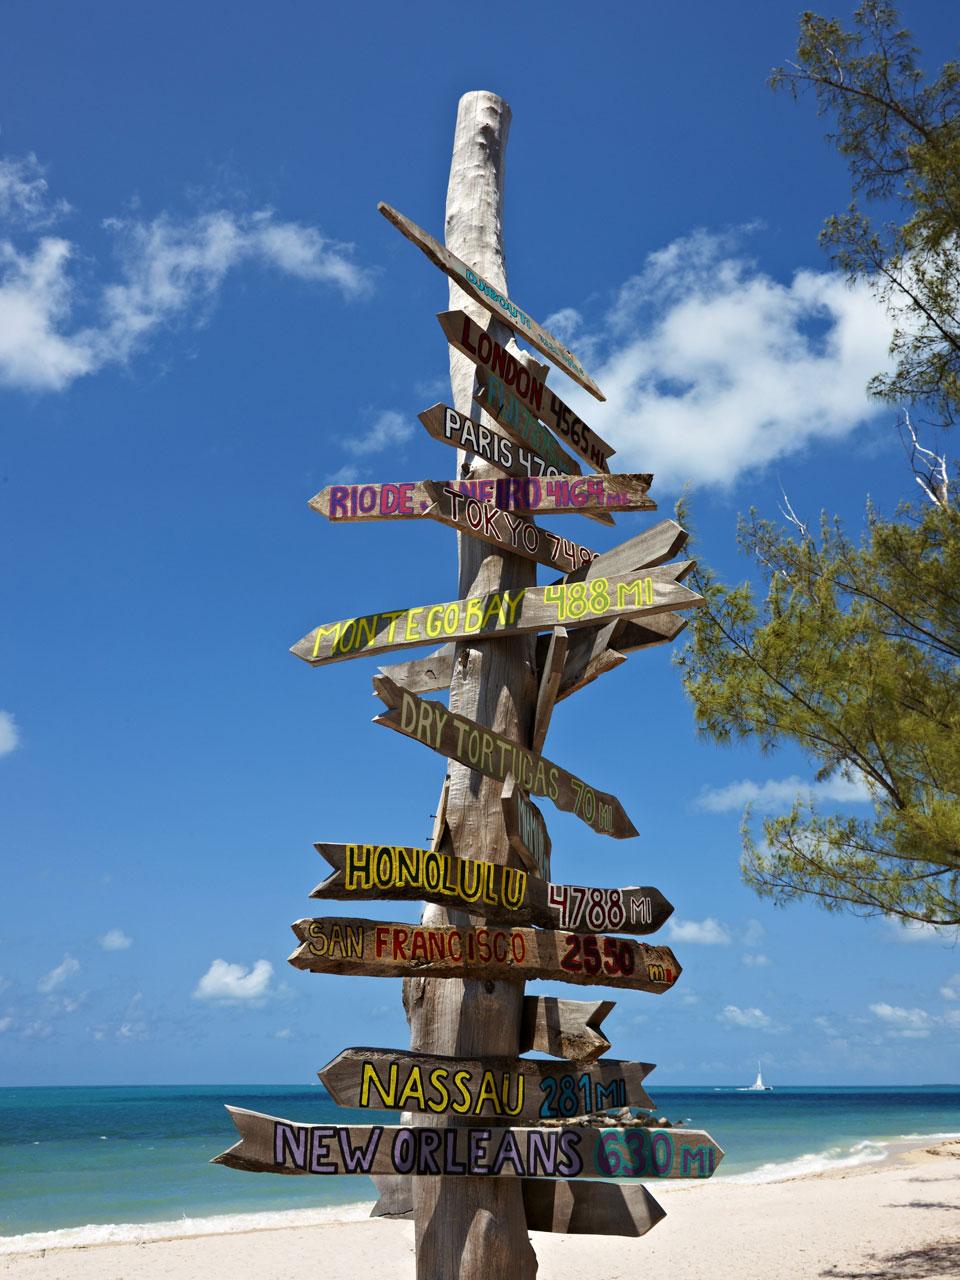 Boston to Key West FL or Vice Versa $117 RT Nonstop Airfares on JetBlue Airways Basic (Flexible Ticket Travel September -